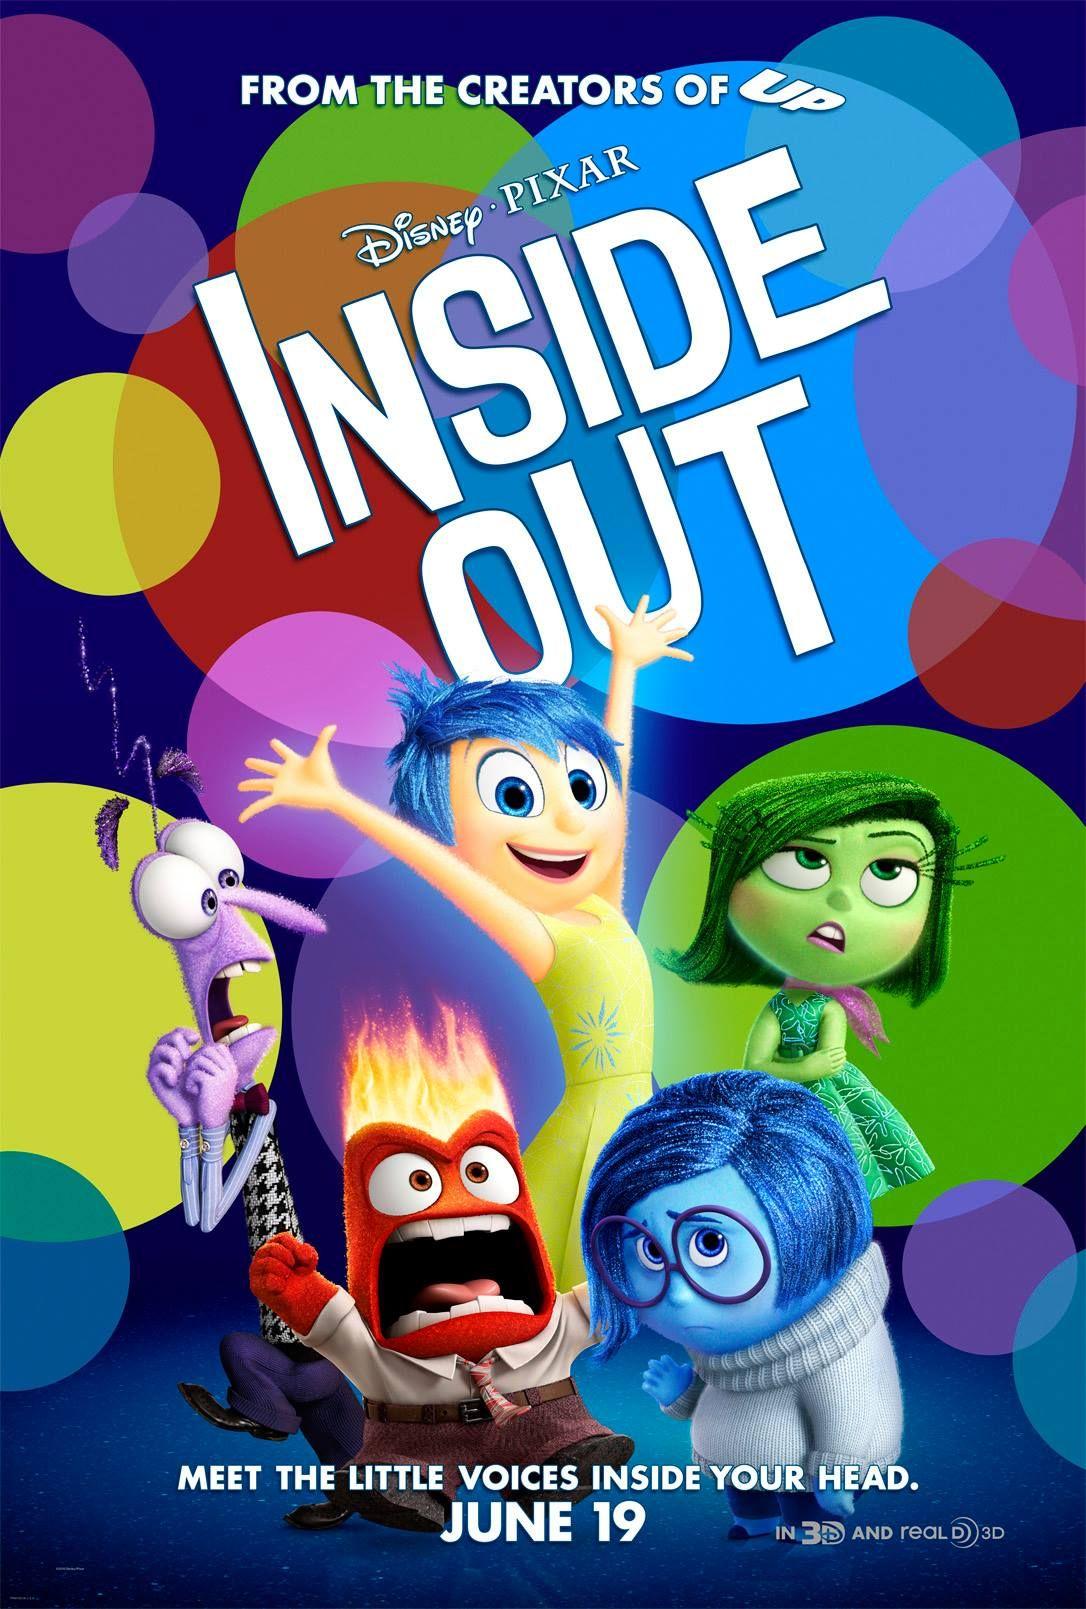 Winner Best Animated Feature Film Nominated For Original